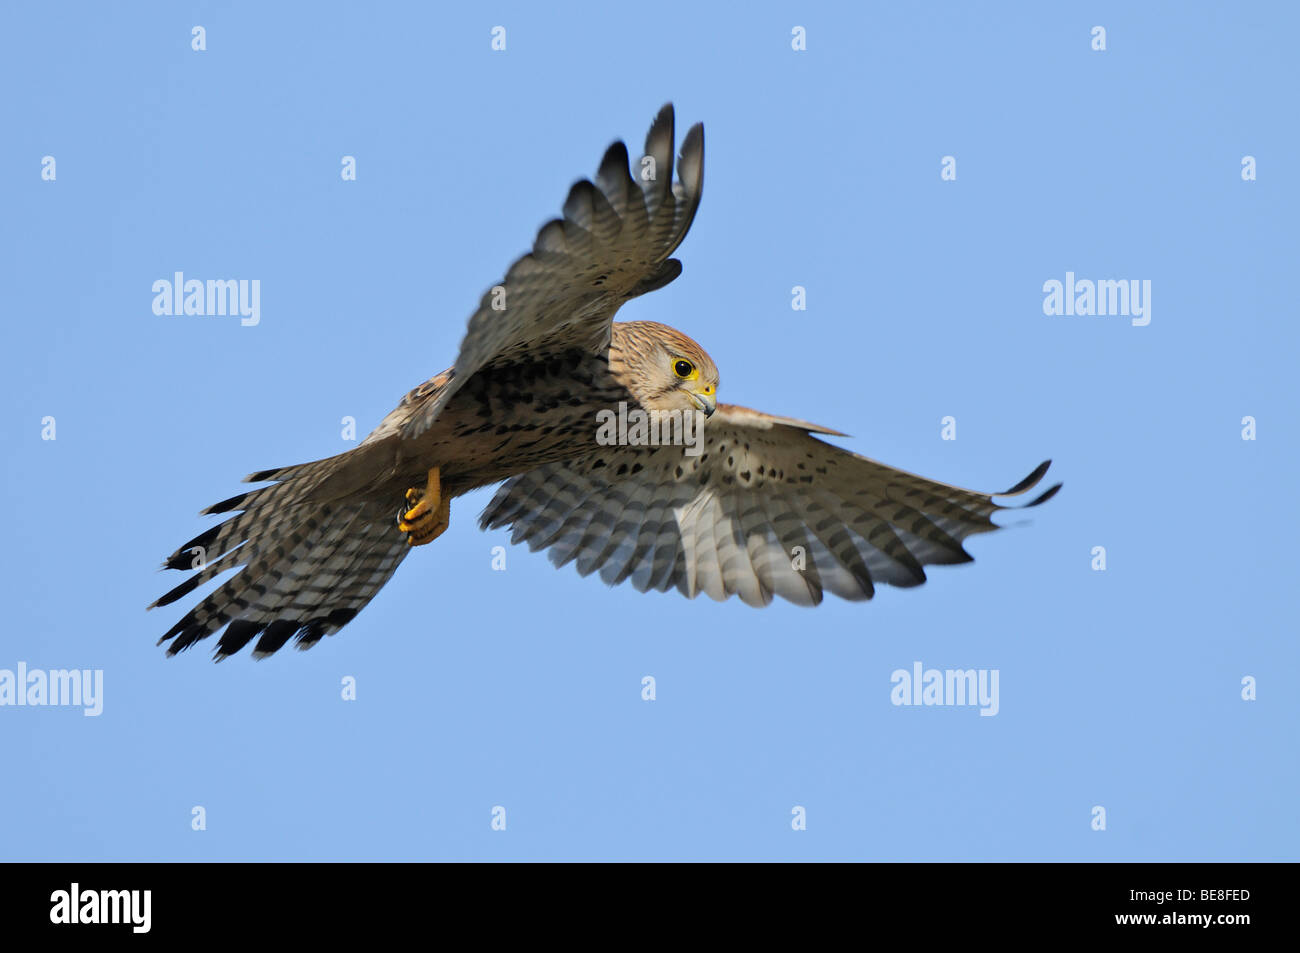 Biddende vrouw Torenvalk met een blauwe lucht; Hoovering female Kestrel against a blue sky Stock Photo